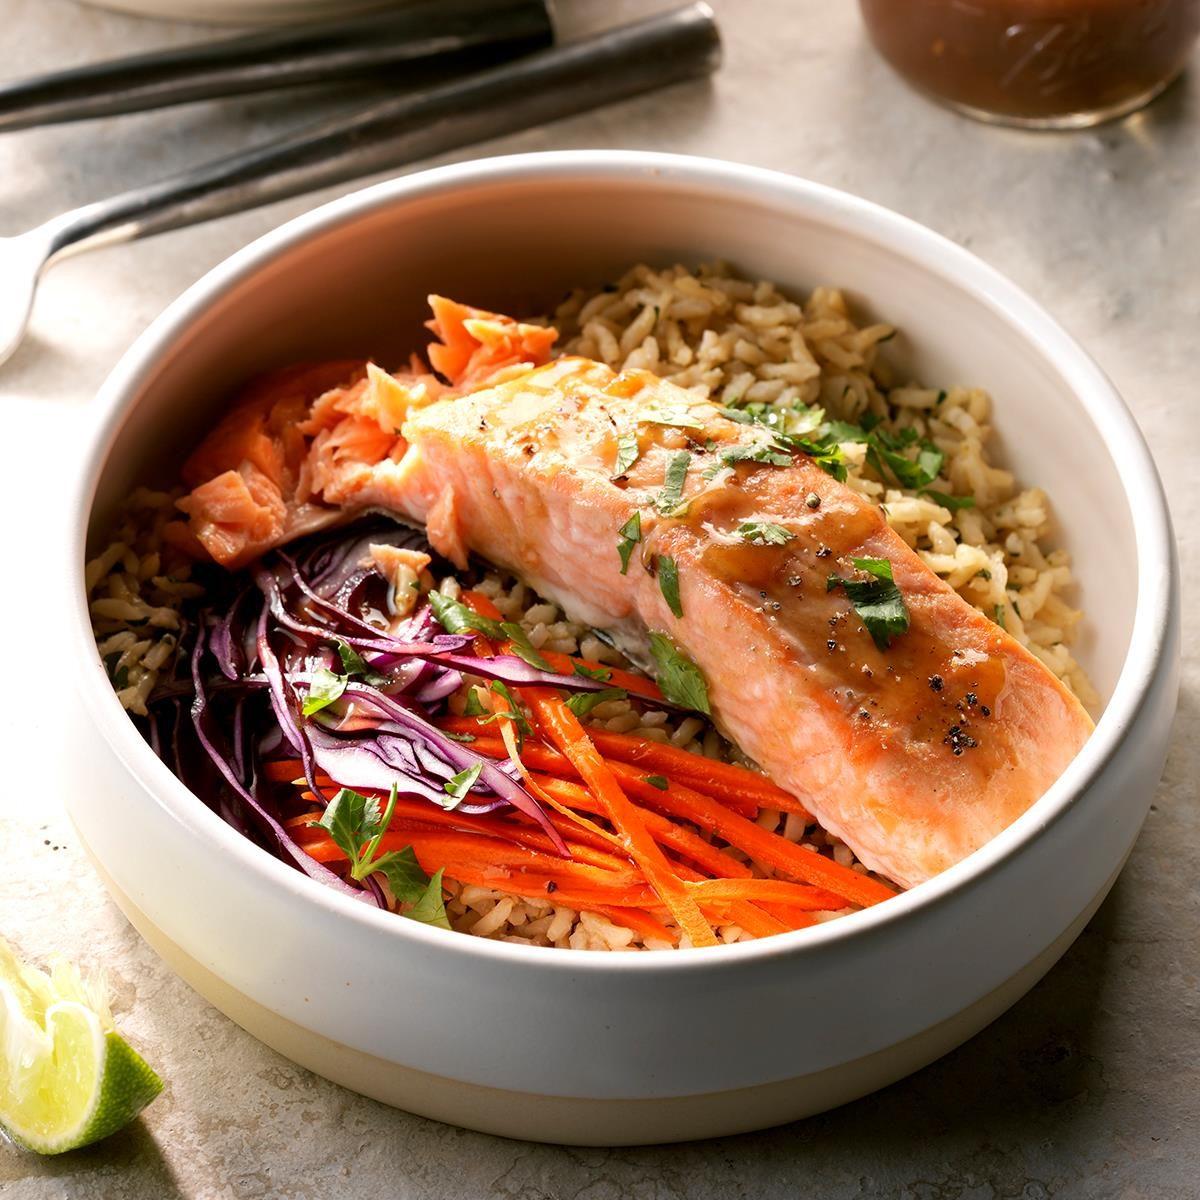 Thai Salmon Brown Rice Bowls Exps Sdfm18 170759 D10 06 1b 4